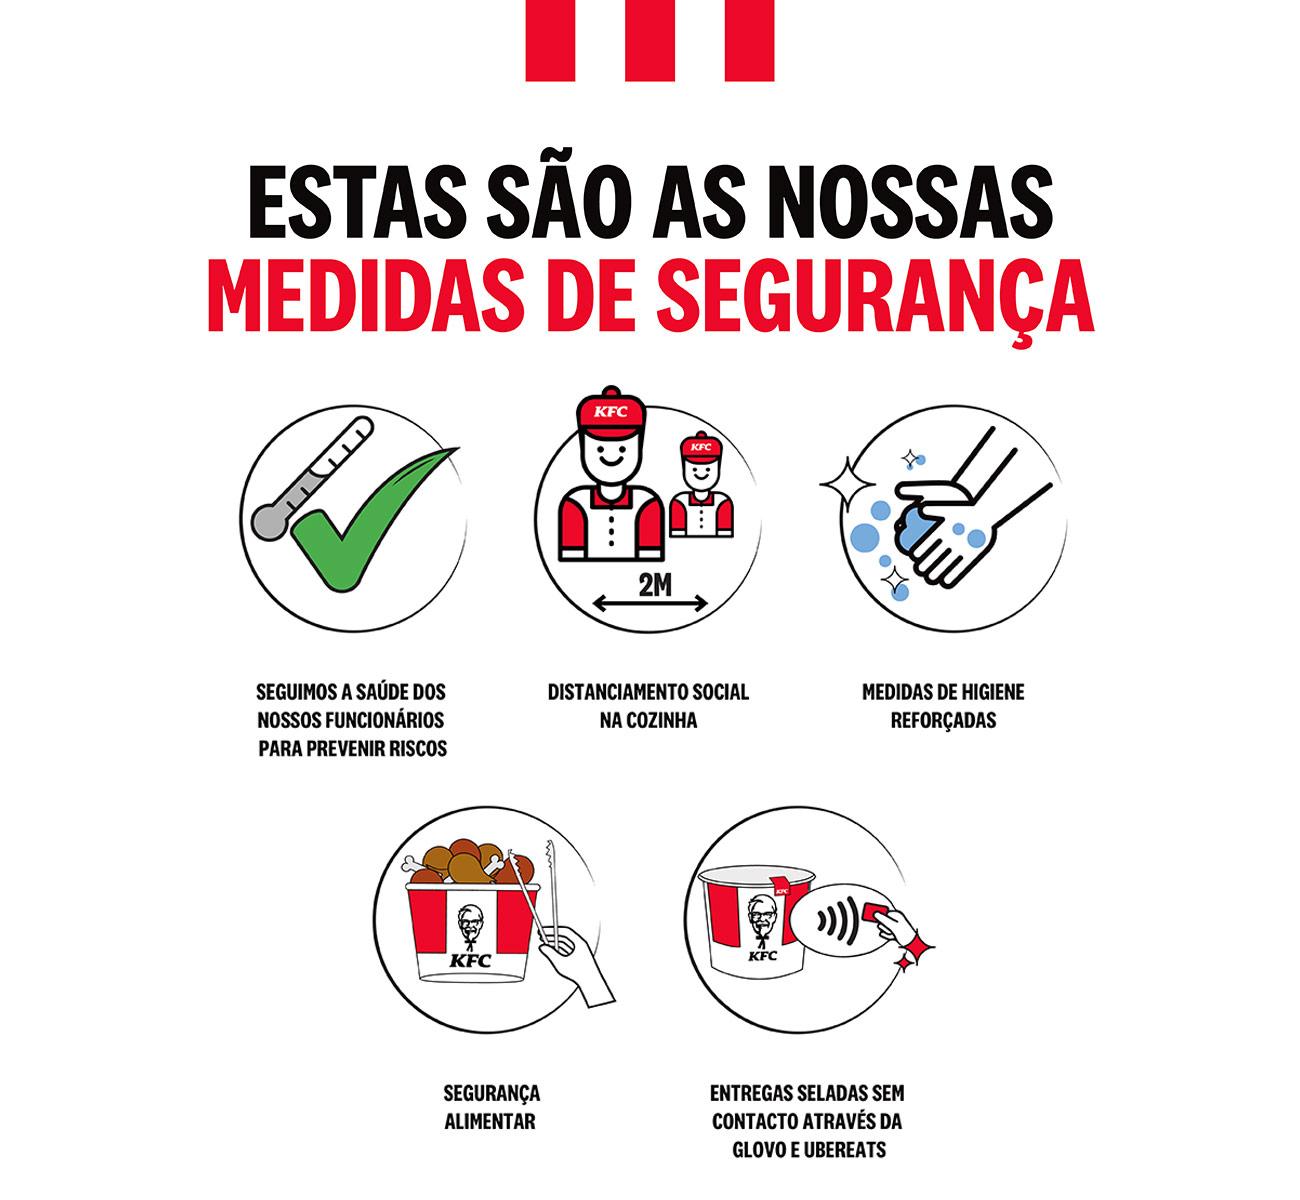 KFC Medidas de Segurança